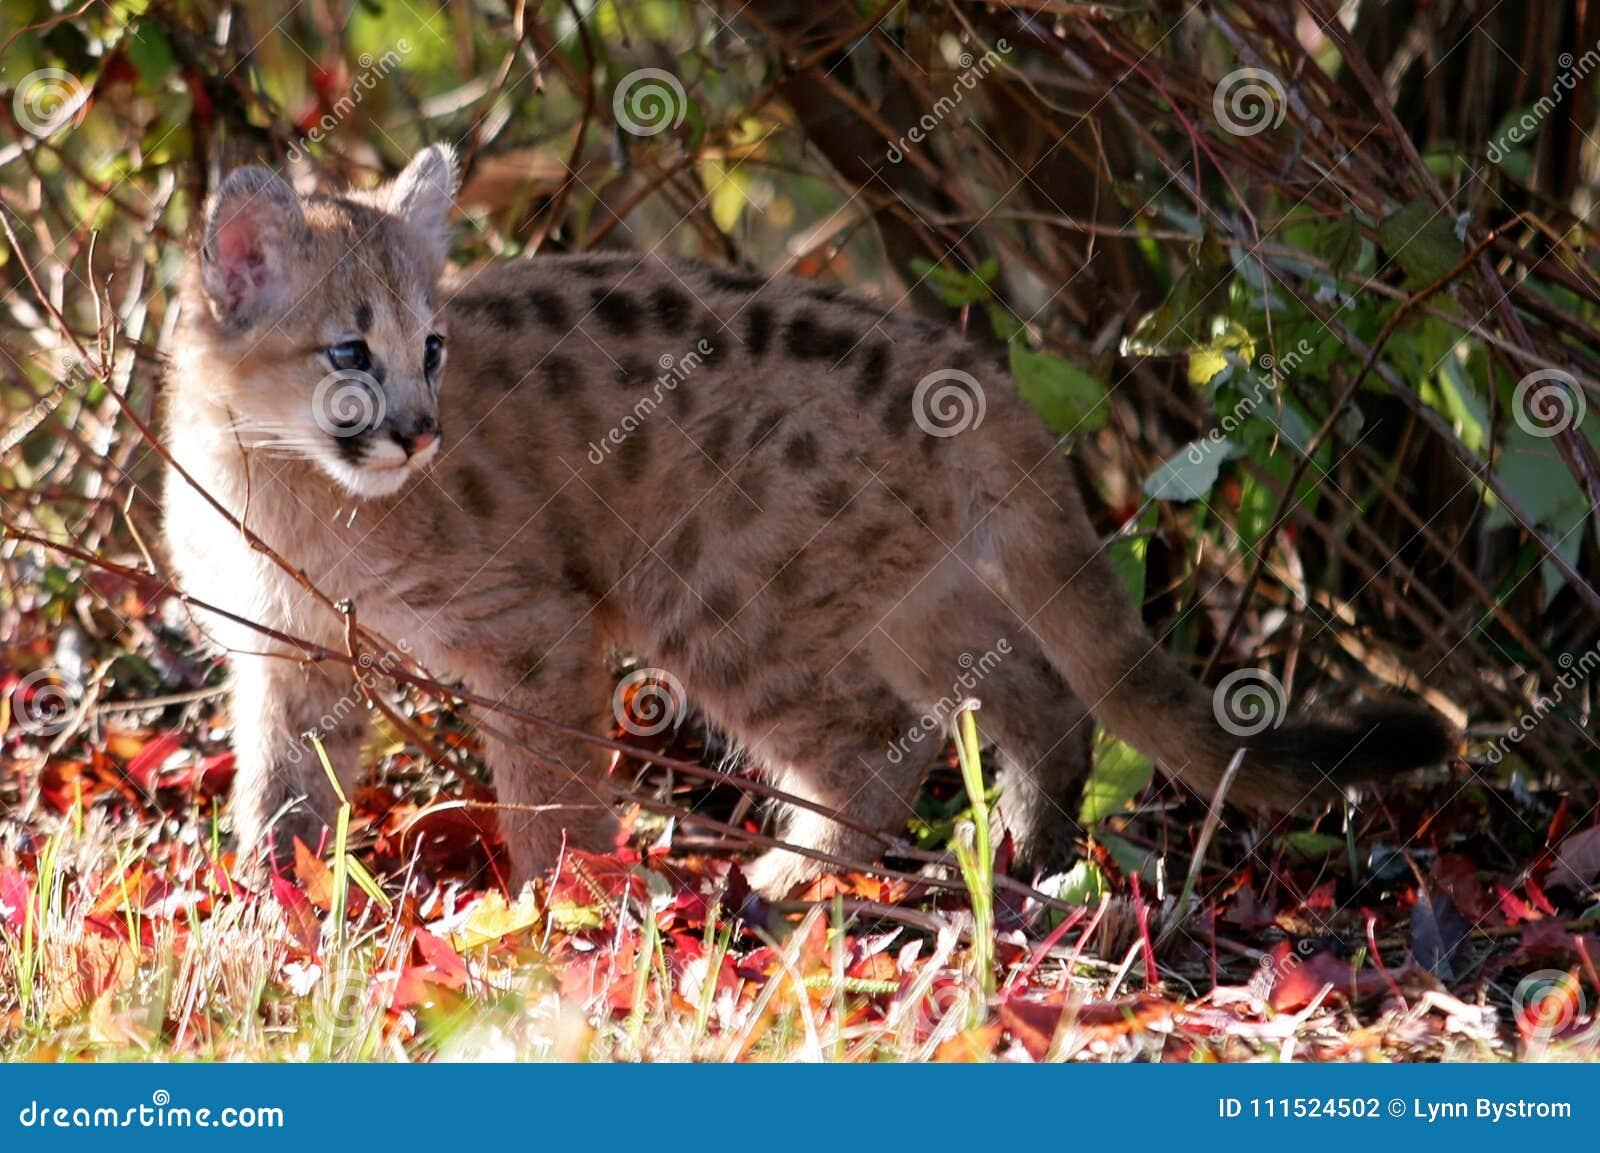 Baby Cougar, Mountain Lion, Or Puma Stock Photo - Image of feline